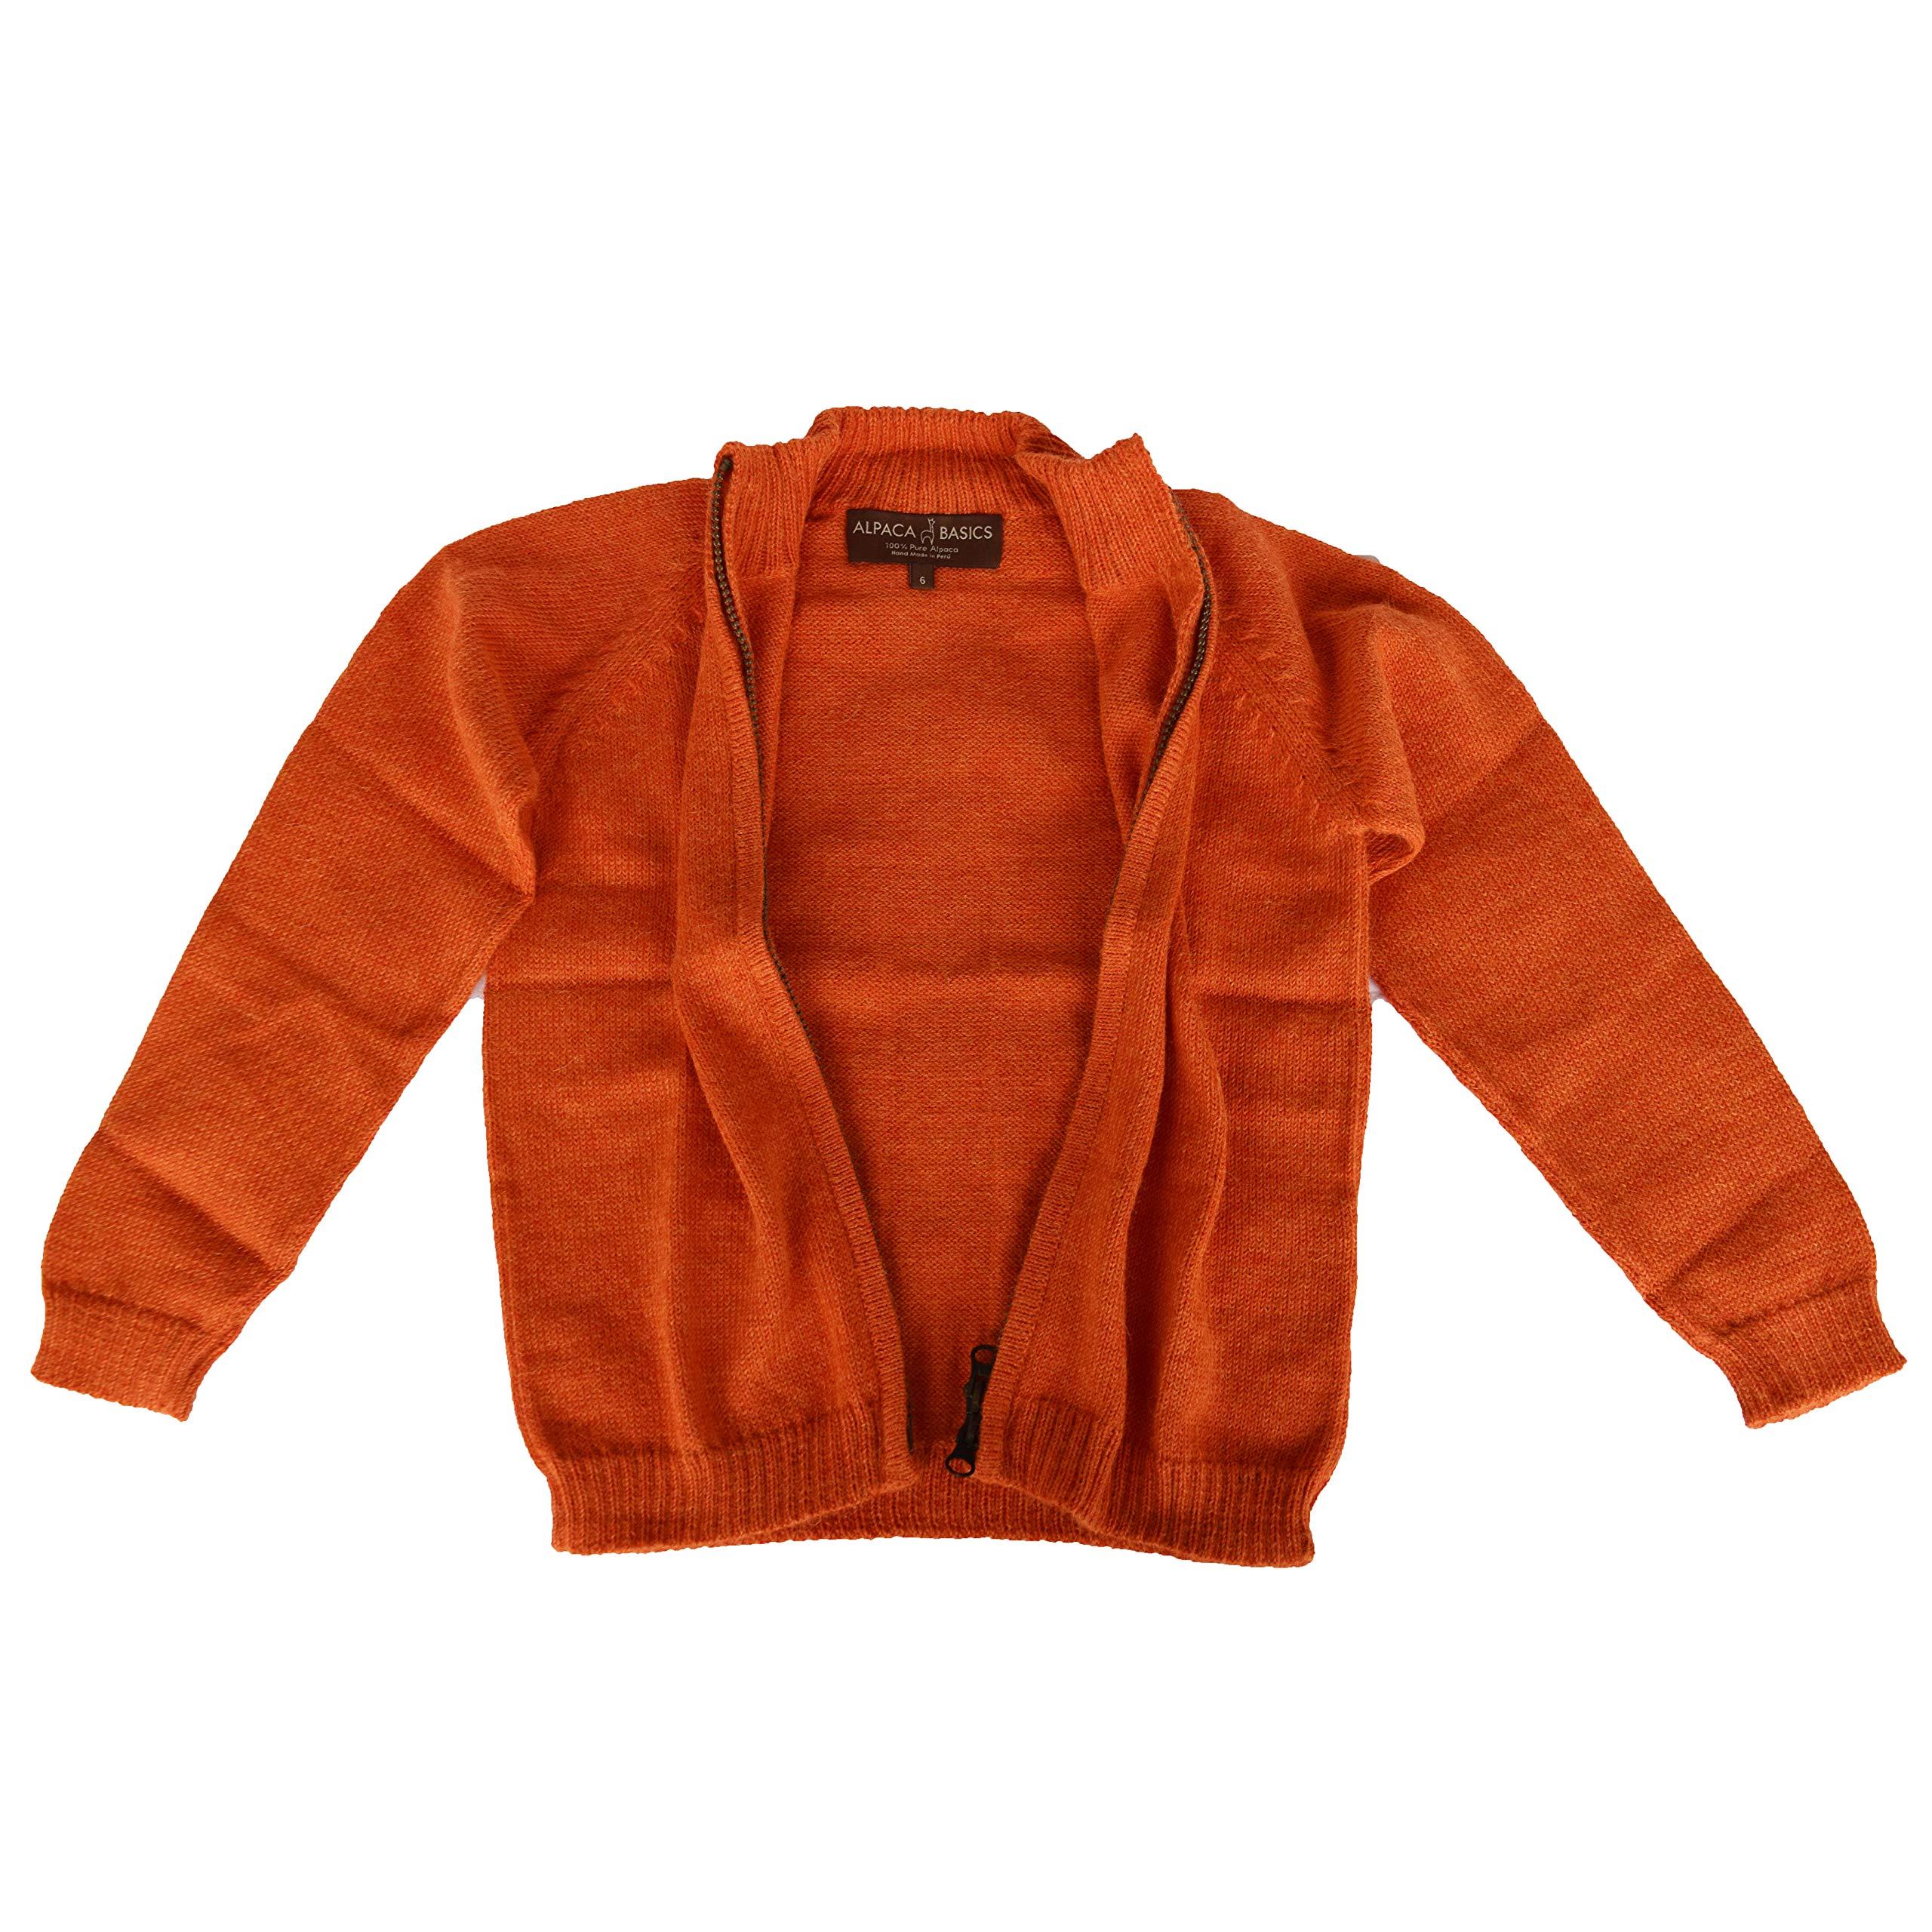 Alpaca Basics Boys Handmade 100% Alpaca Wool Full Zip Sweater (Tangerine, 12)